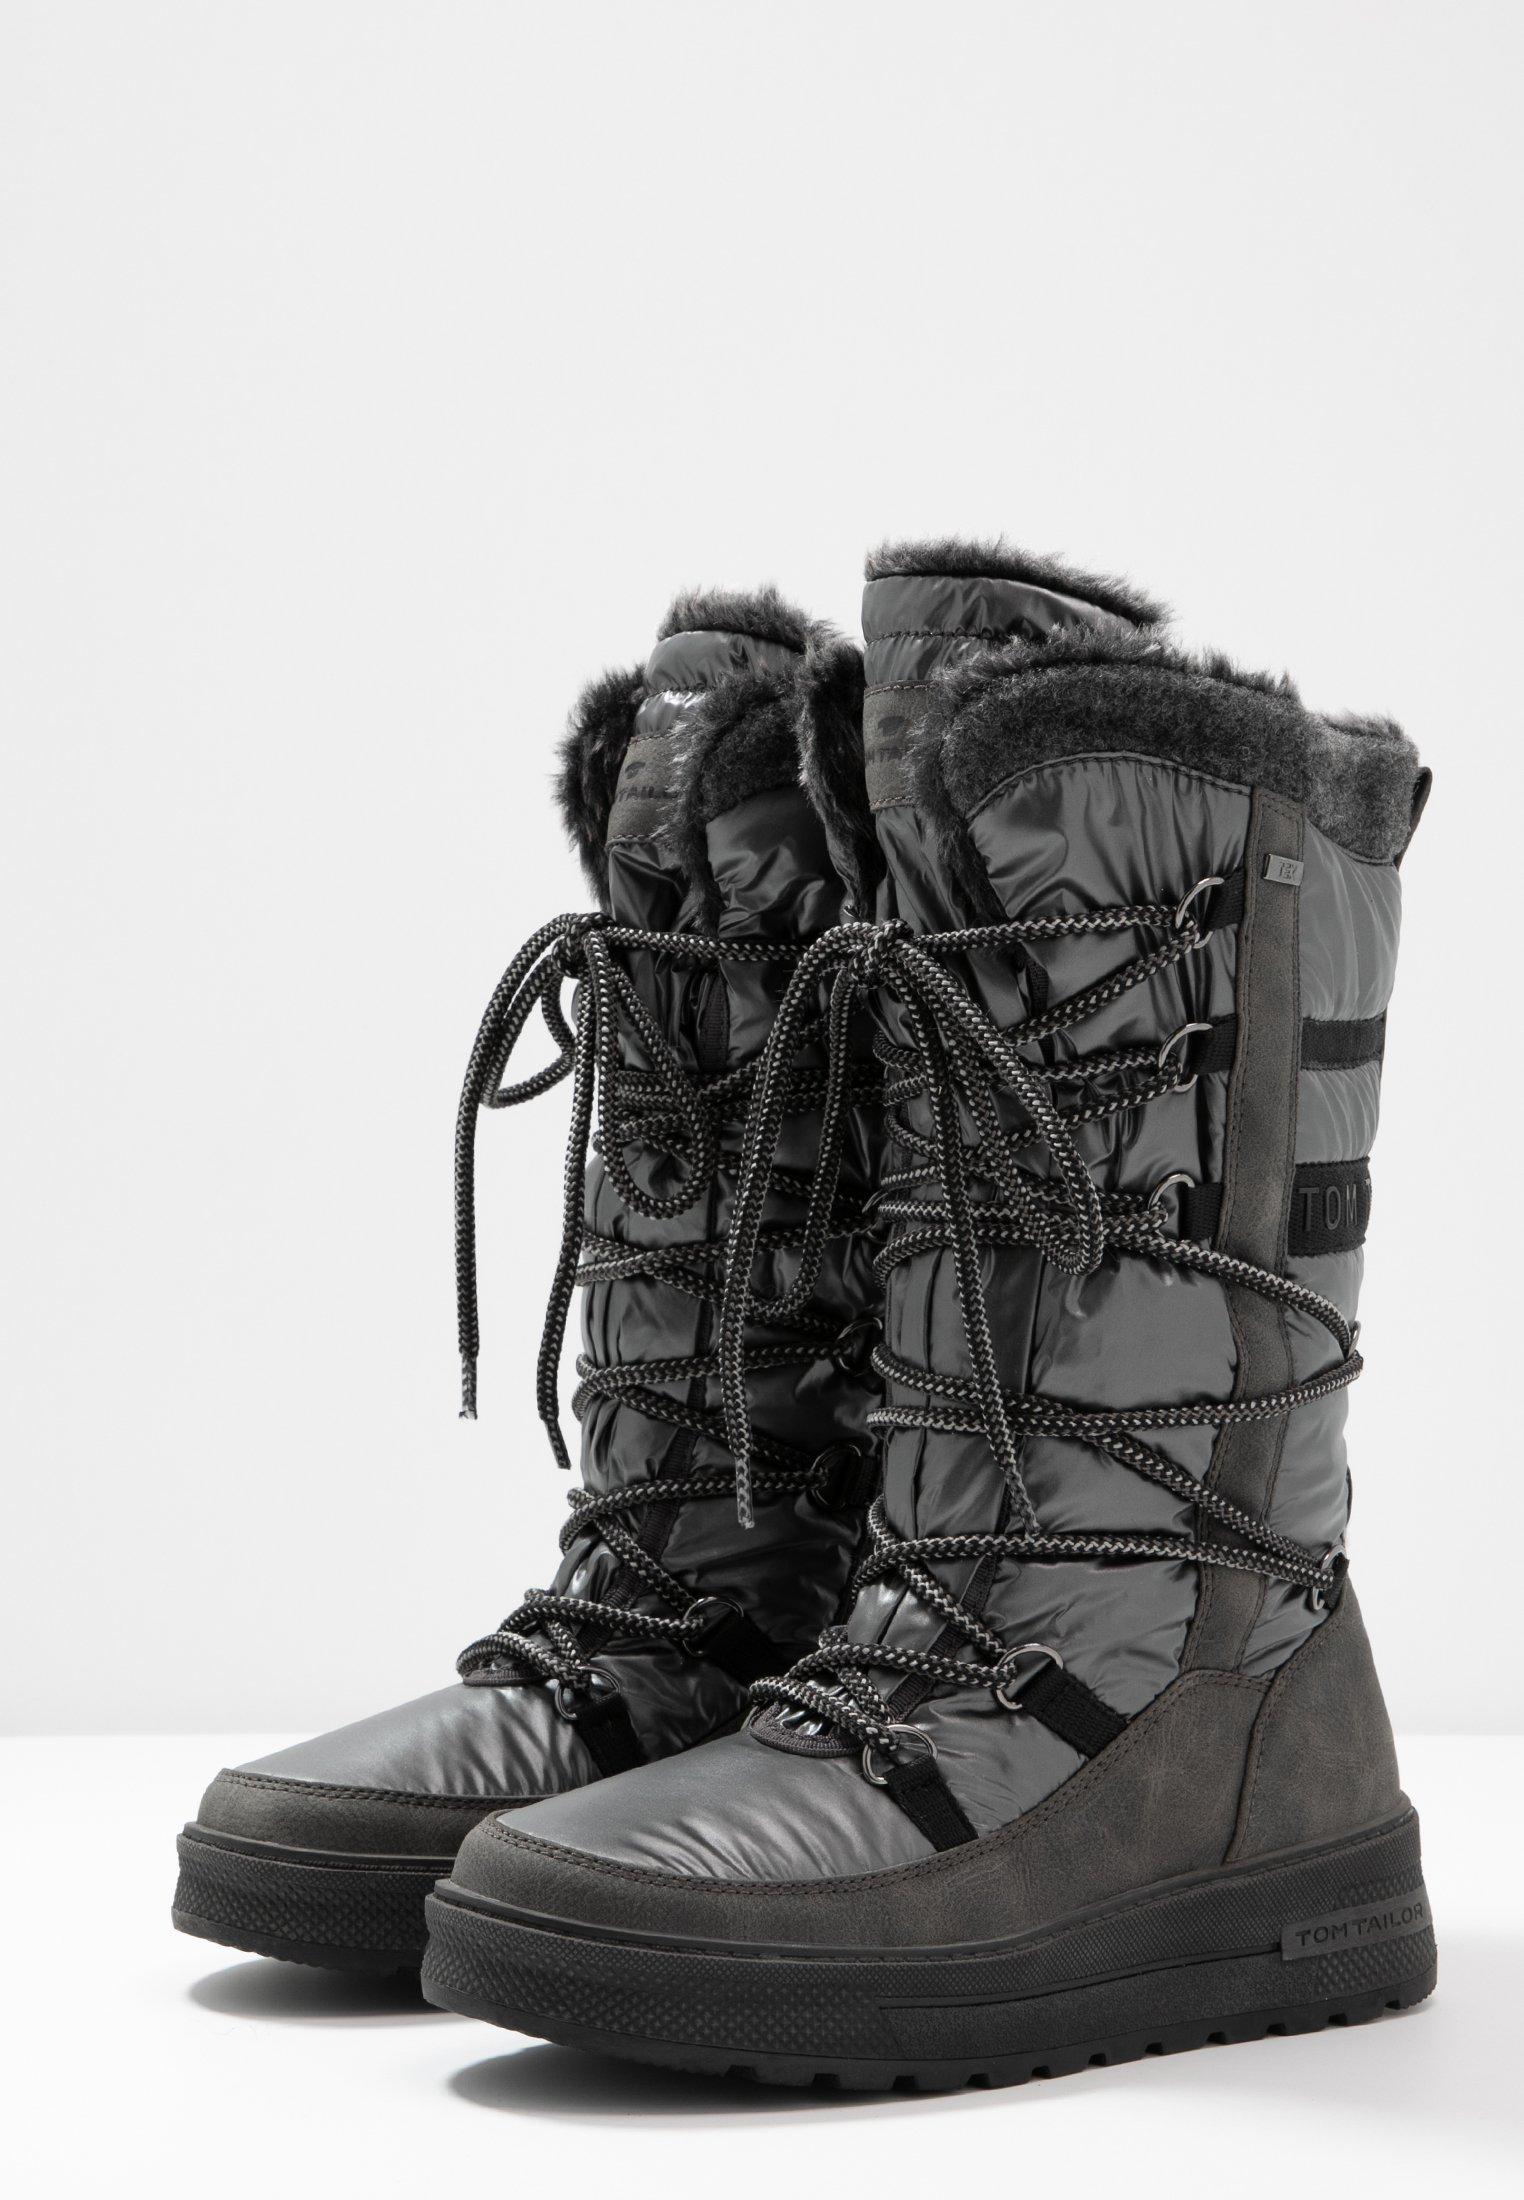 Tom Tailor Snowboot/winterstiefel - Coal Black Friday